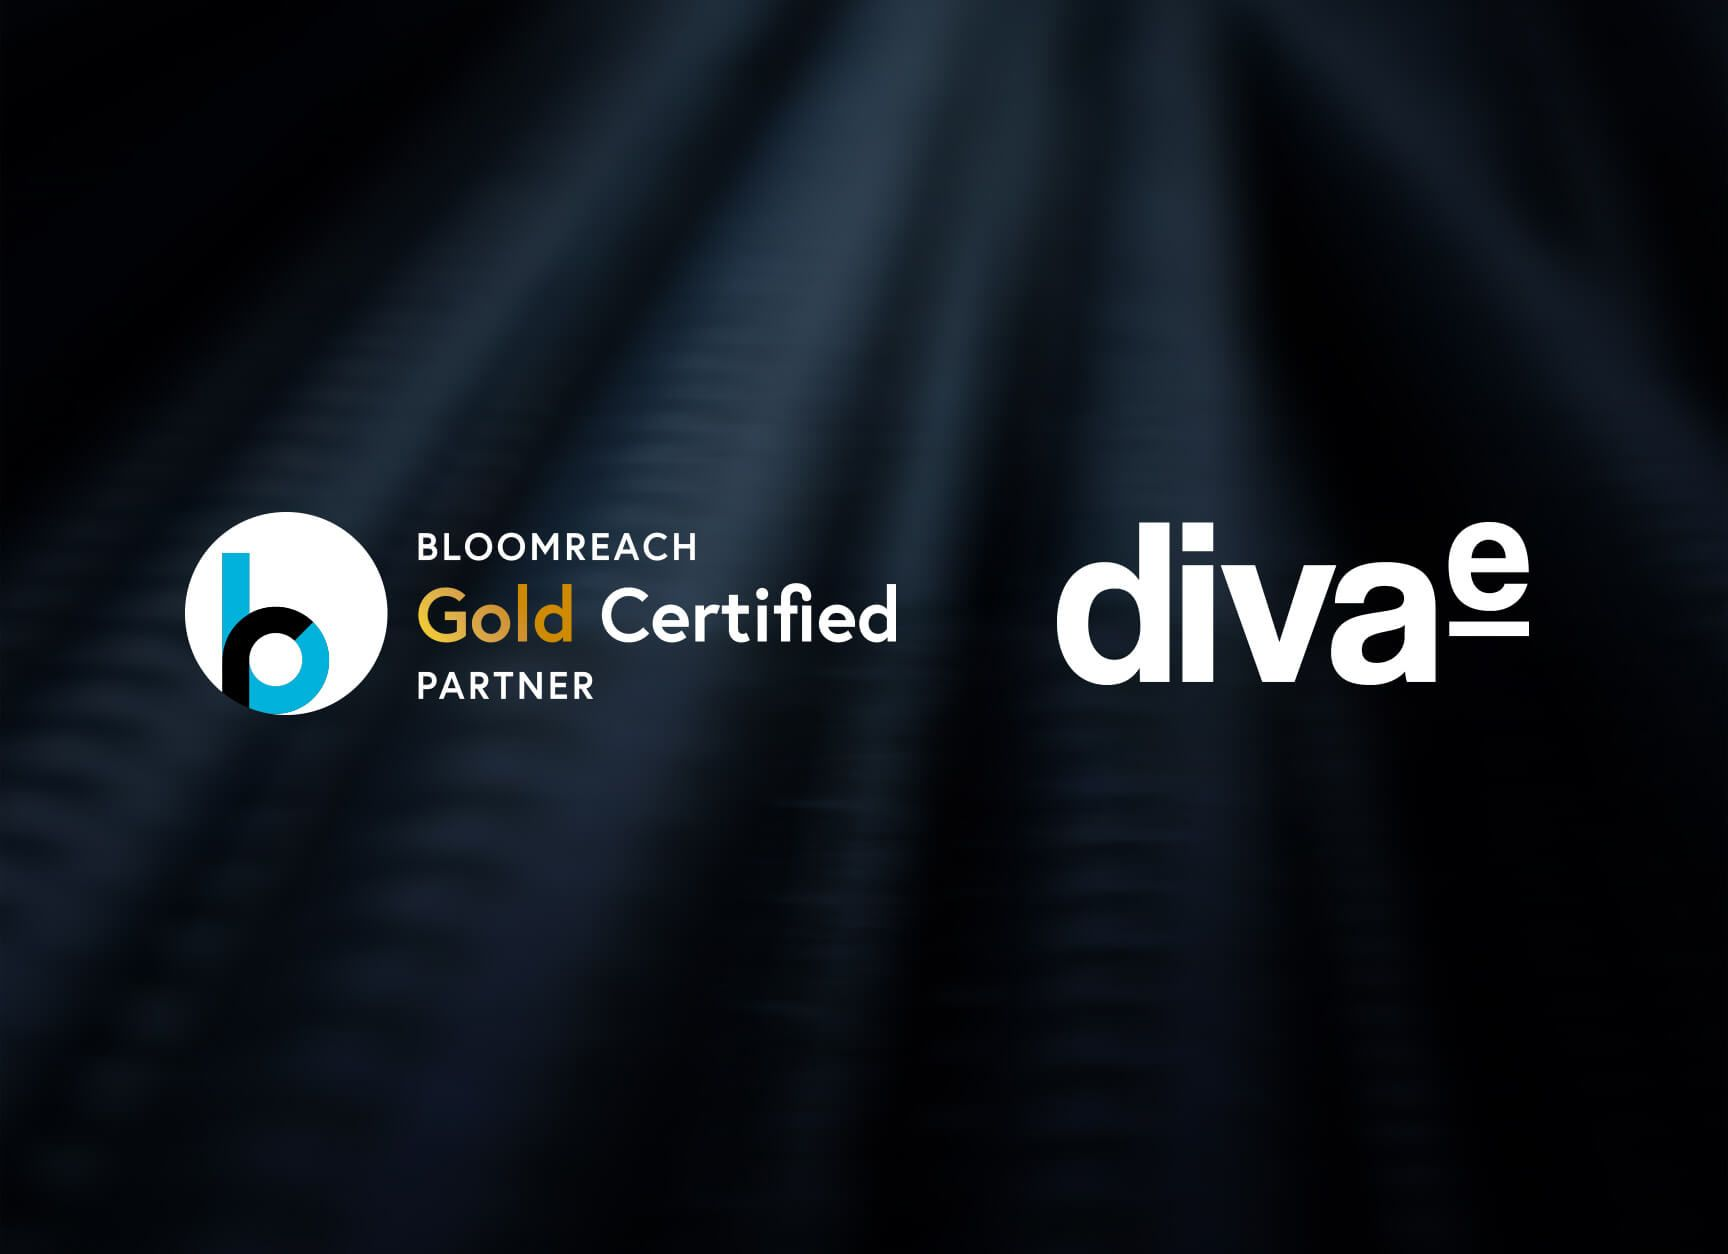 BloomReach and diva-e extend gold partnership